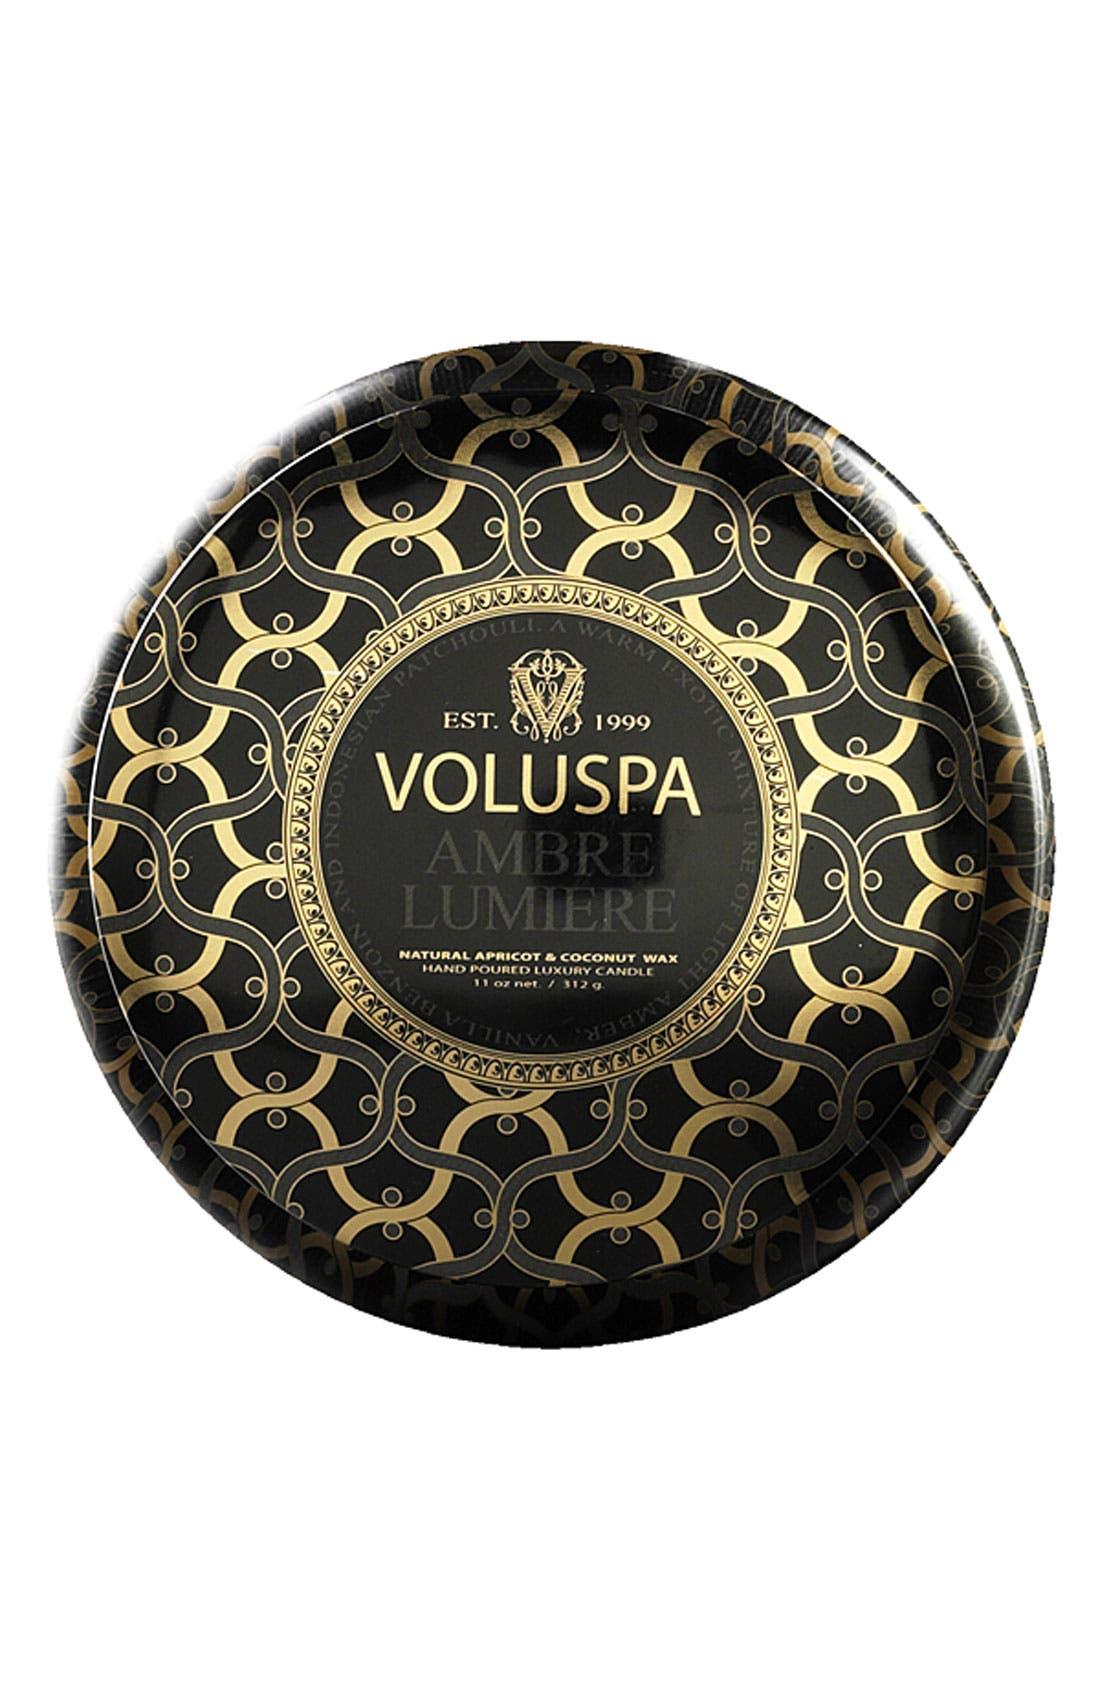 Voluspa 'Maison Noir - Ambre Lumiere' 2-Wick Scented Candle